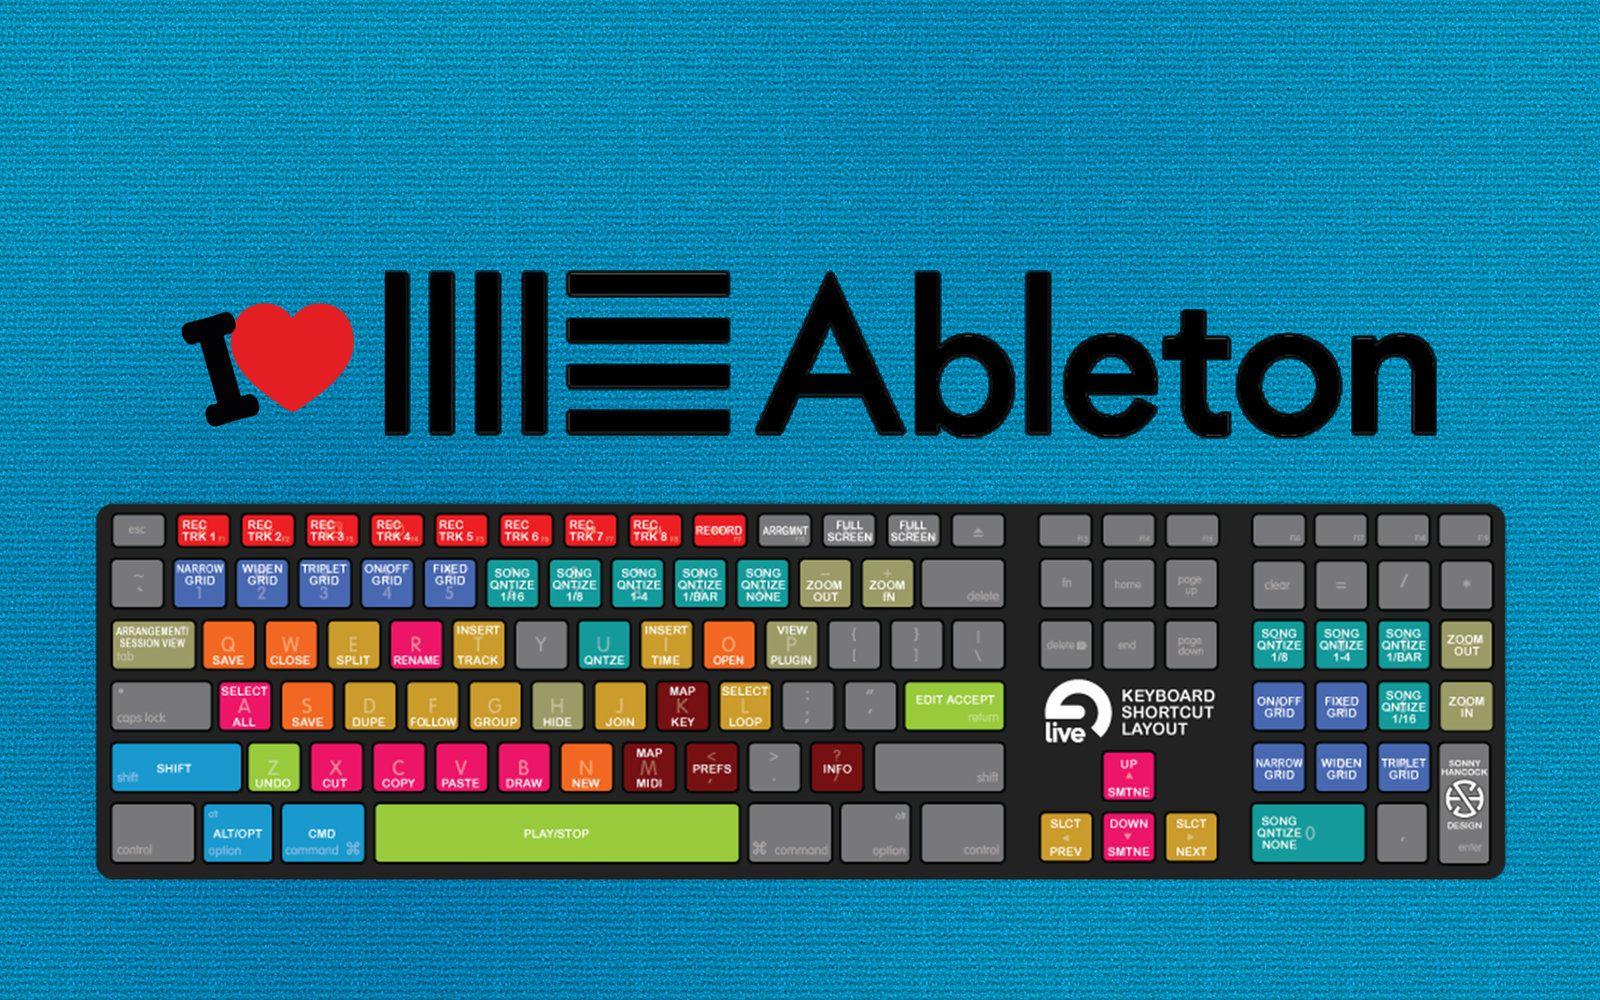 I Love Ableton Shortcut Keyboard Ableton Music Mixing Ableton Live